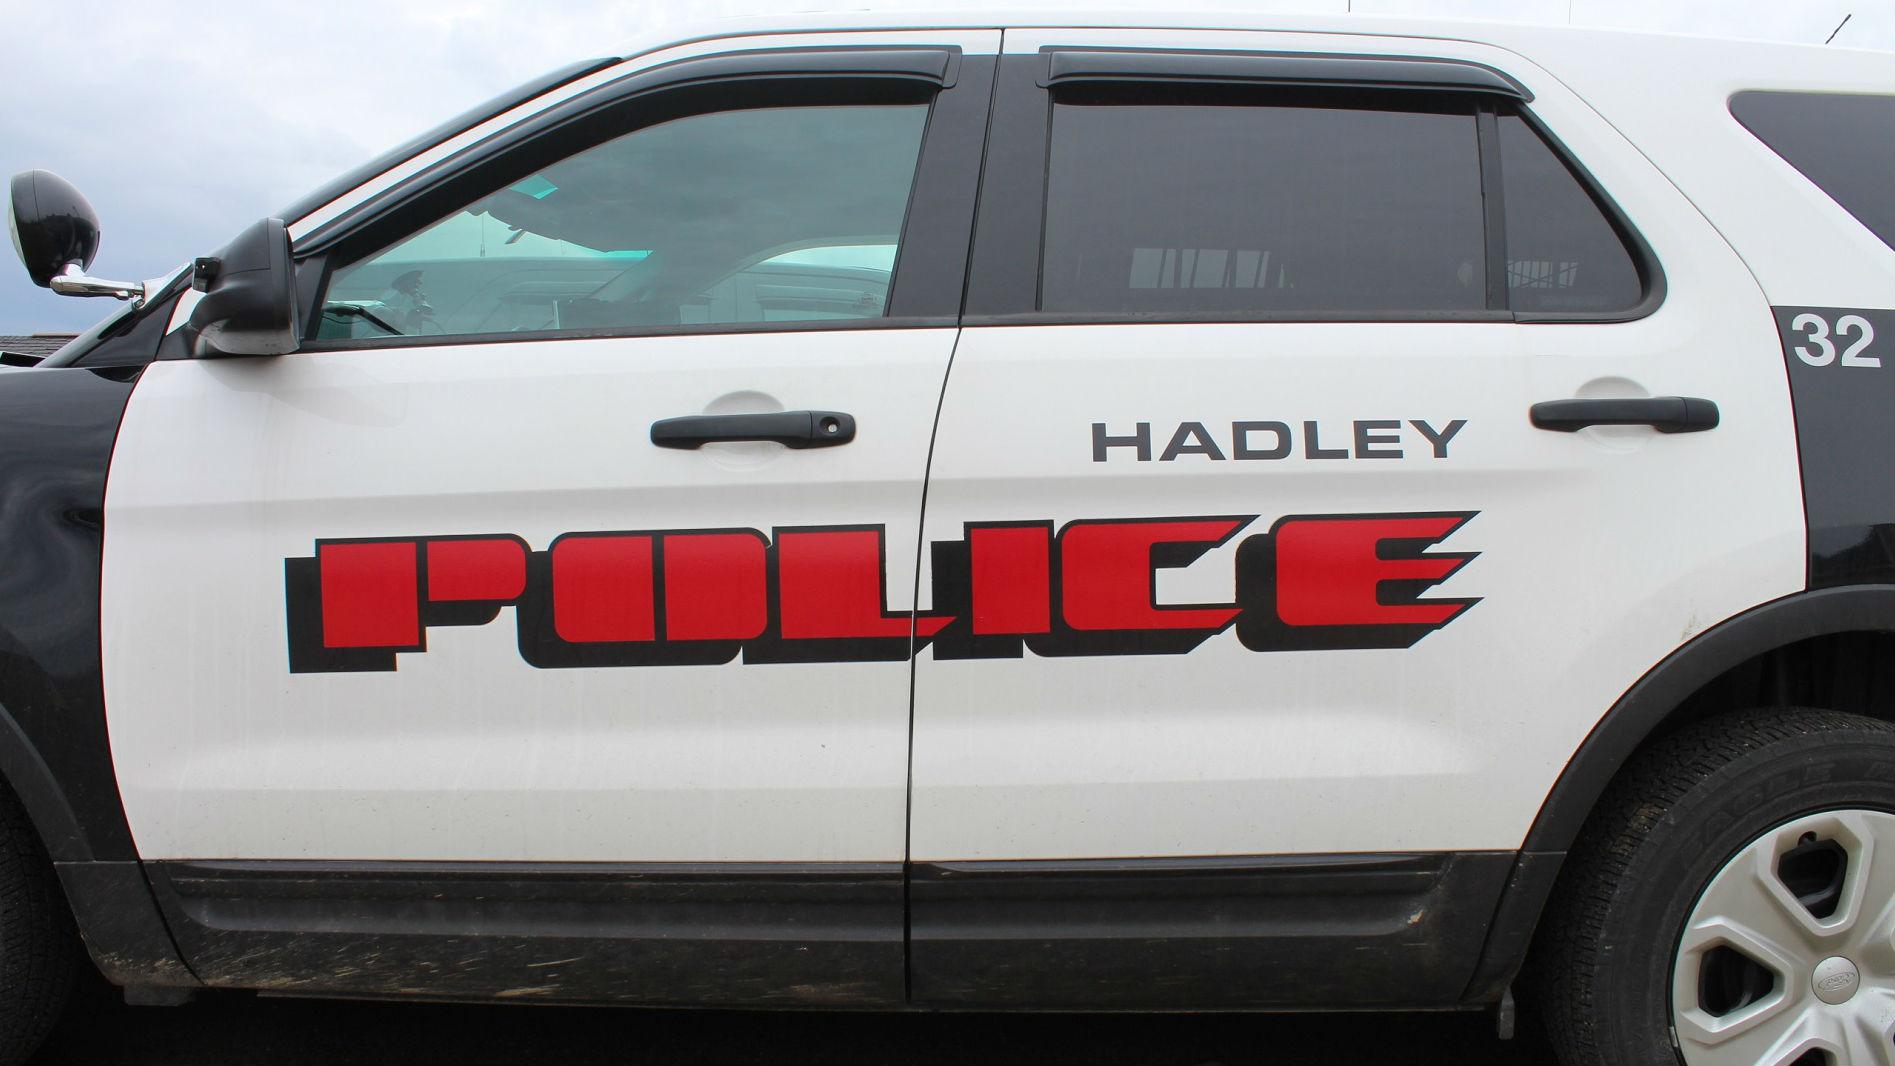 Hadley Police Car_1525299006728.jpg.jpg